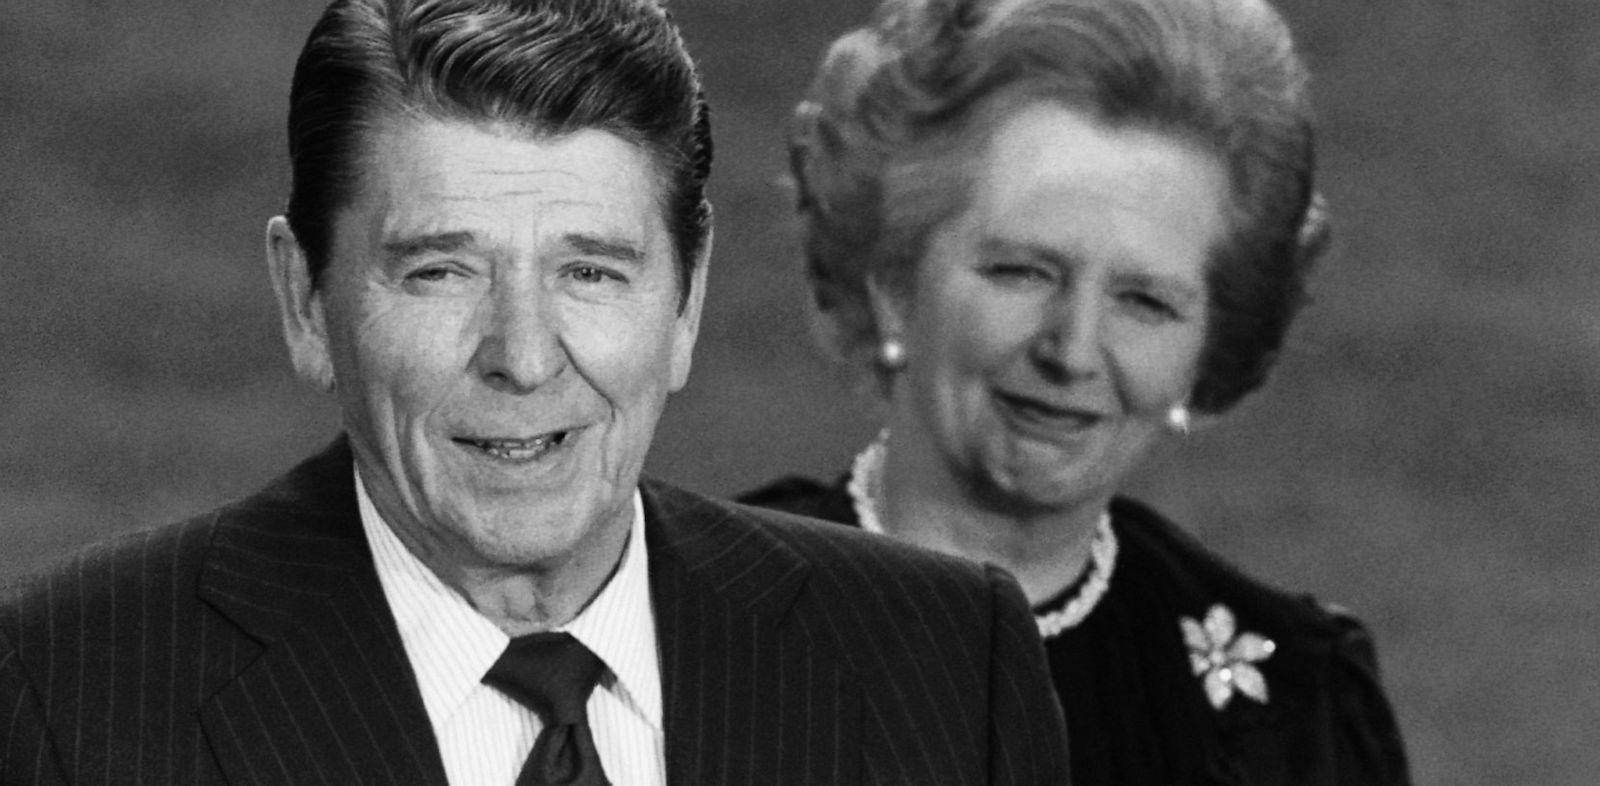 PHOTO: President Ronald Reagan alongside British Prime Minister Margaret Thatcher